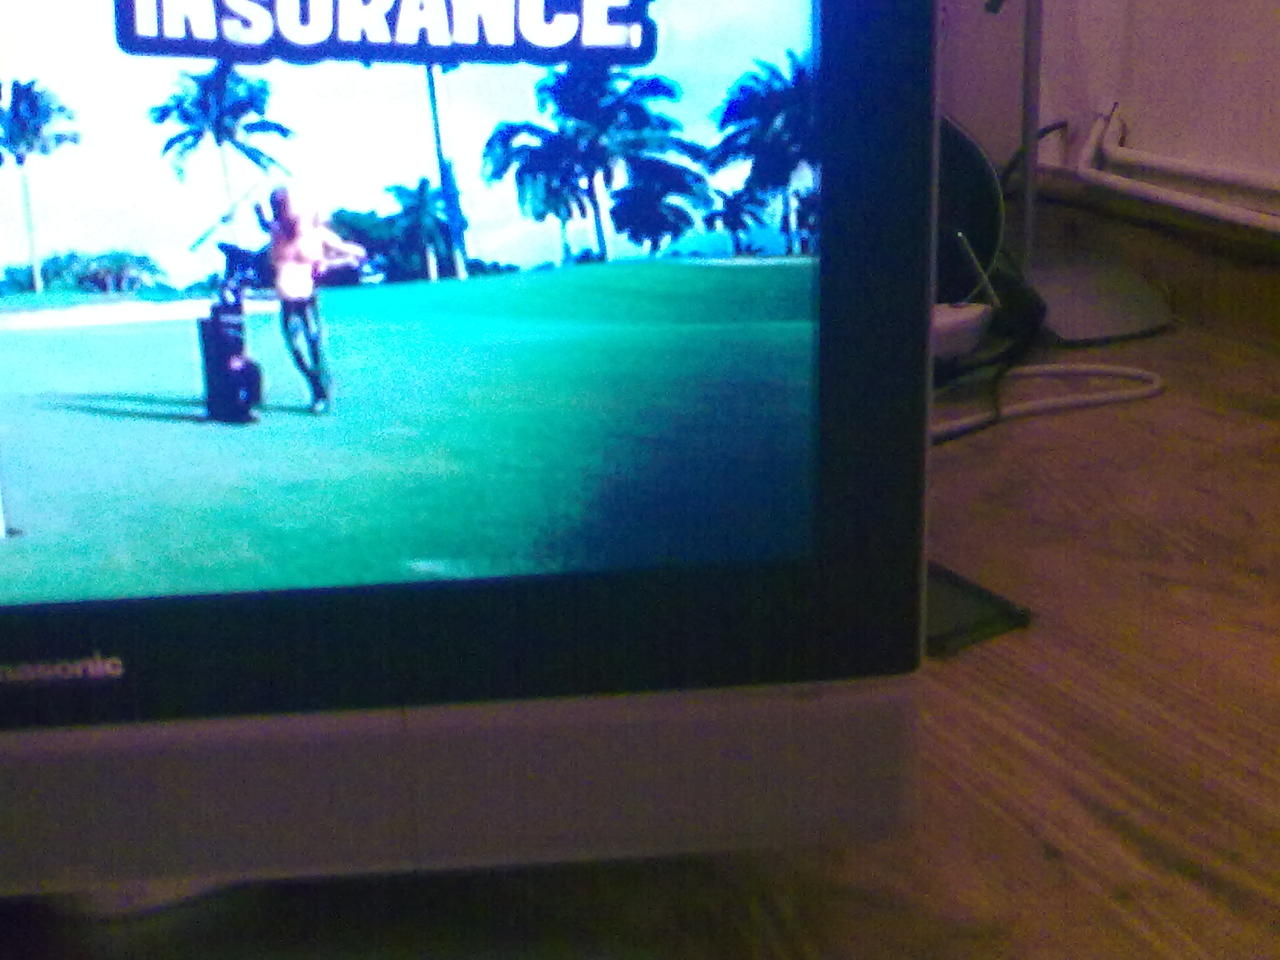 Dark shadow on screen - Panasonic TX26LXD25   AVForums